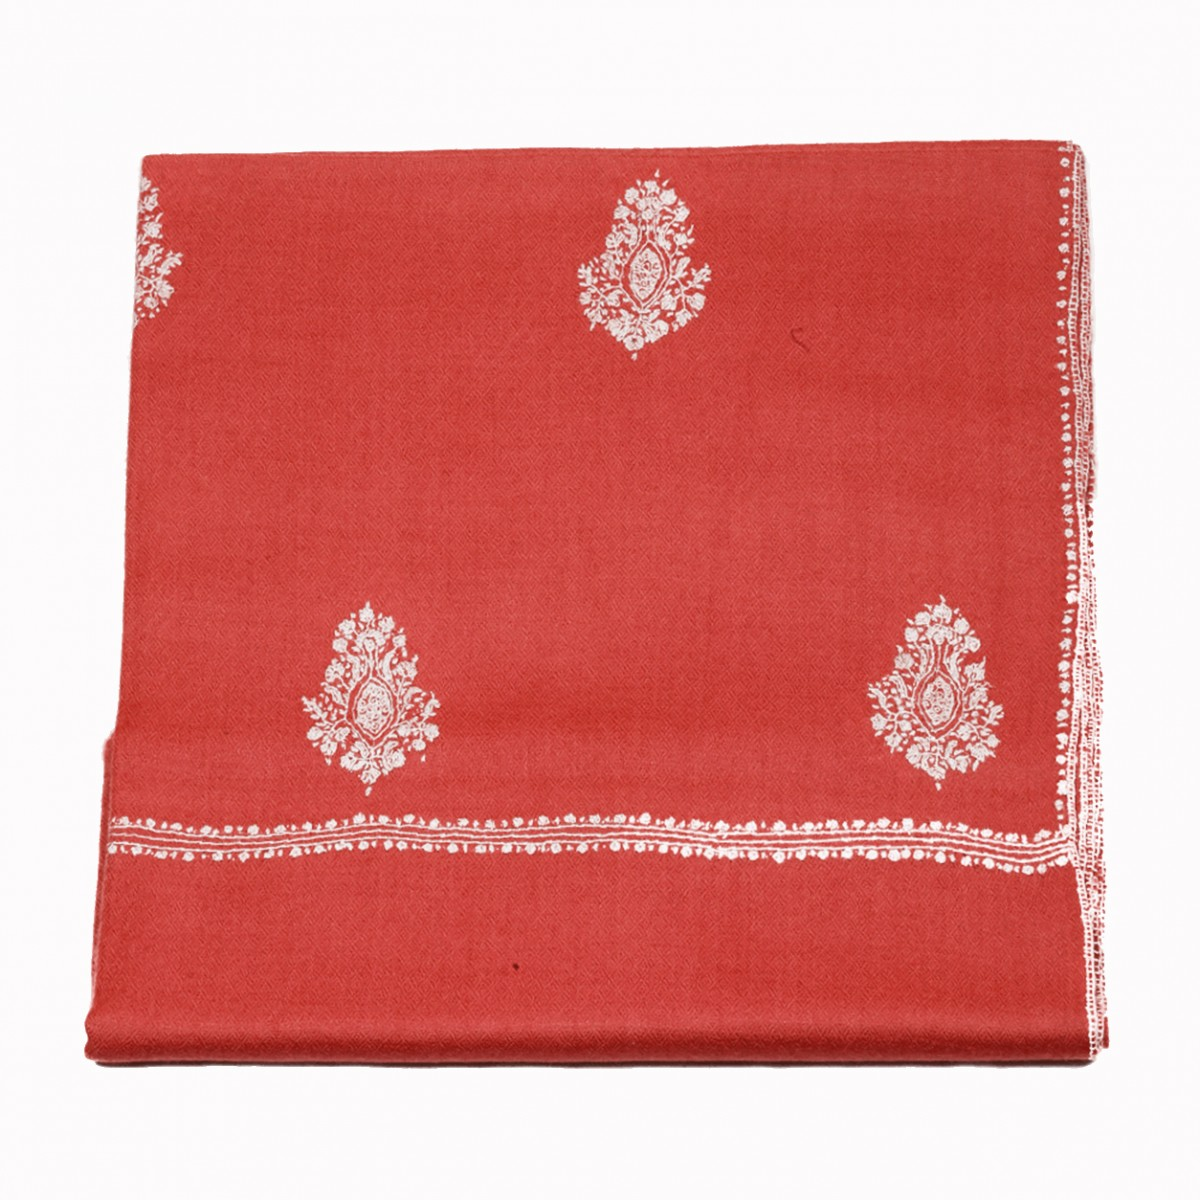 Embroidery Handloom Pashmina - Rouge